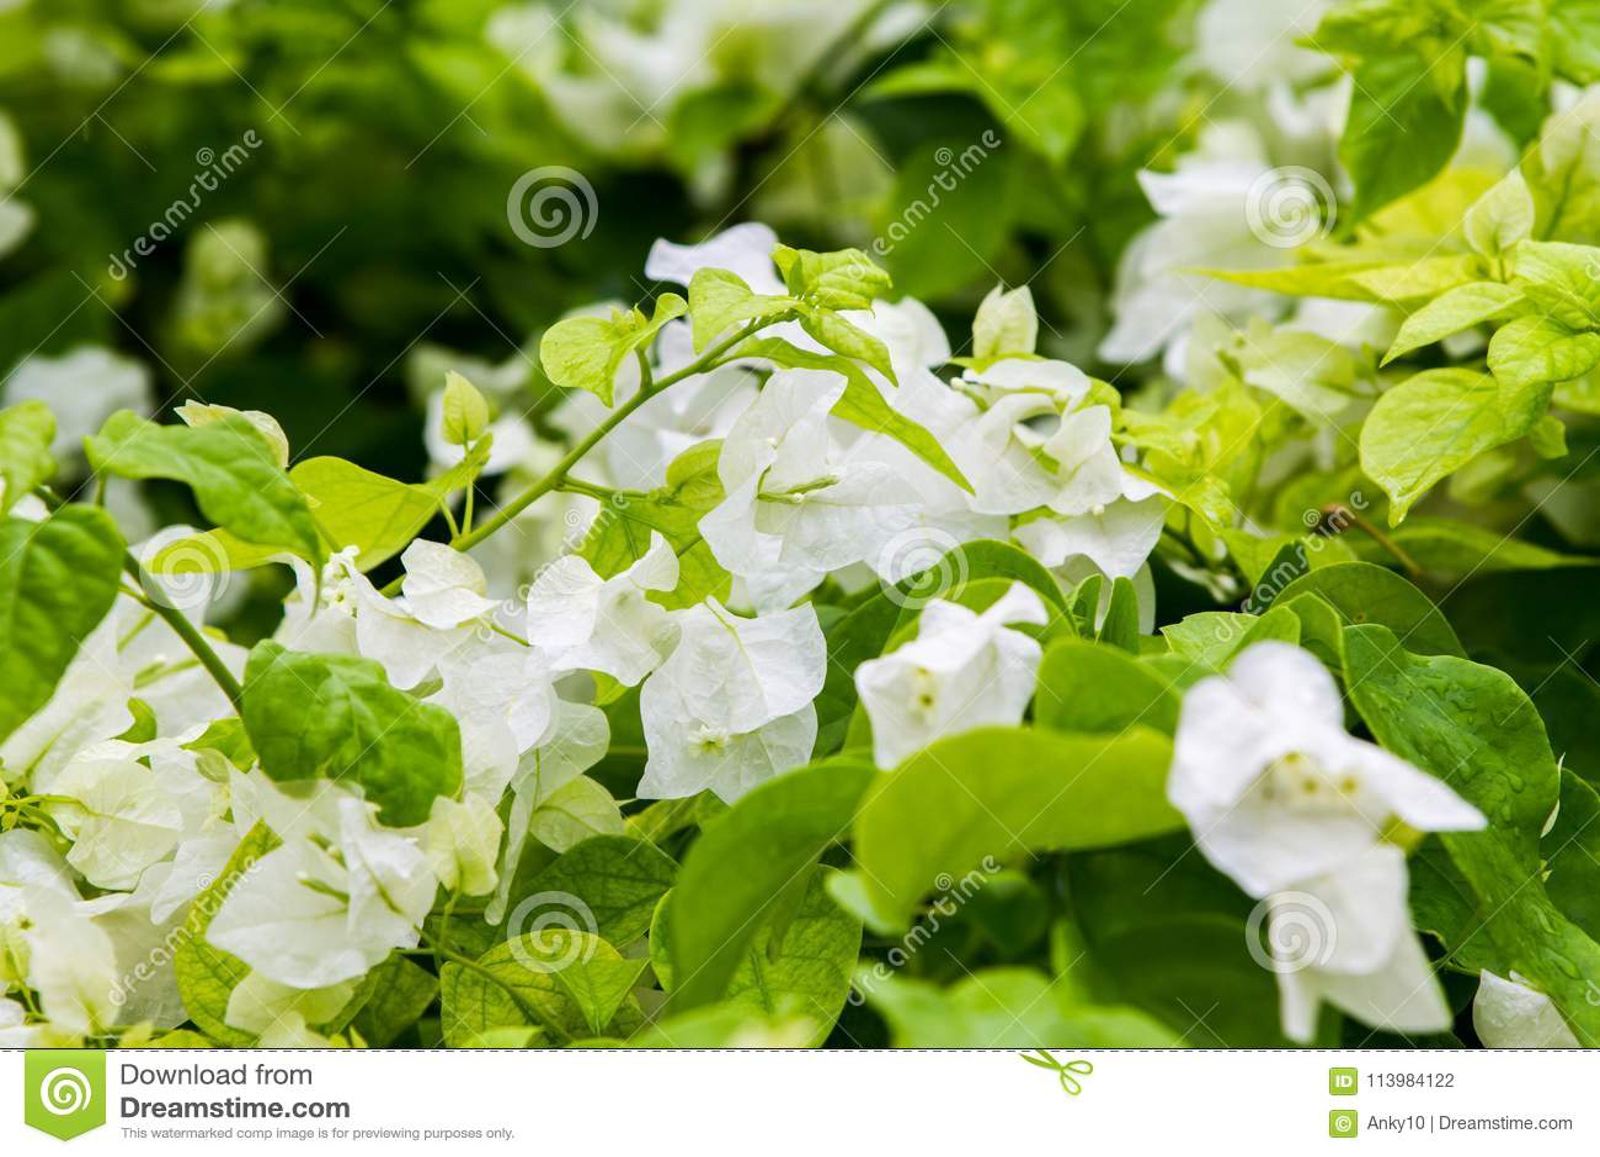 White Bougainvillea Thorny Ornamental Vines Stock Photo Image Of